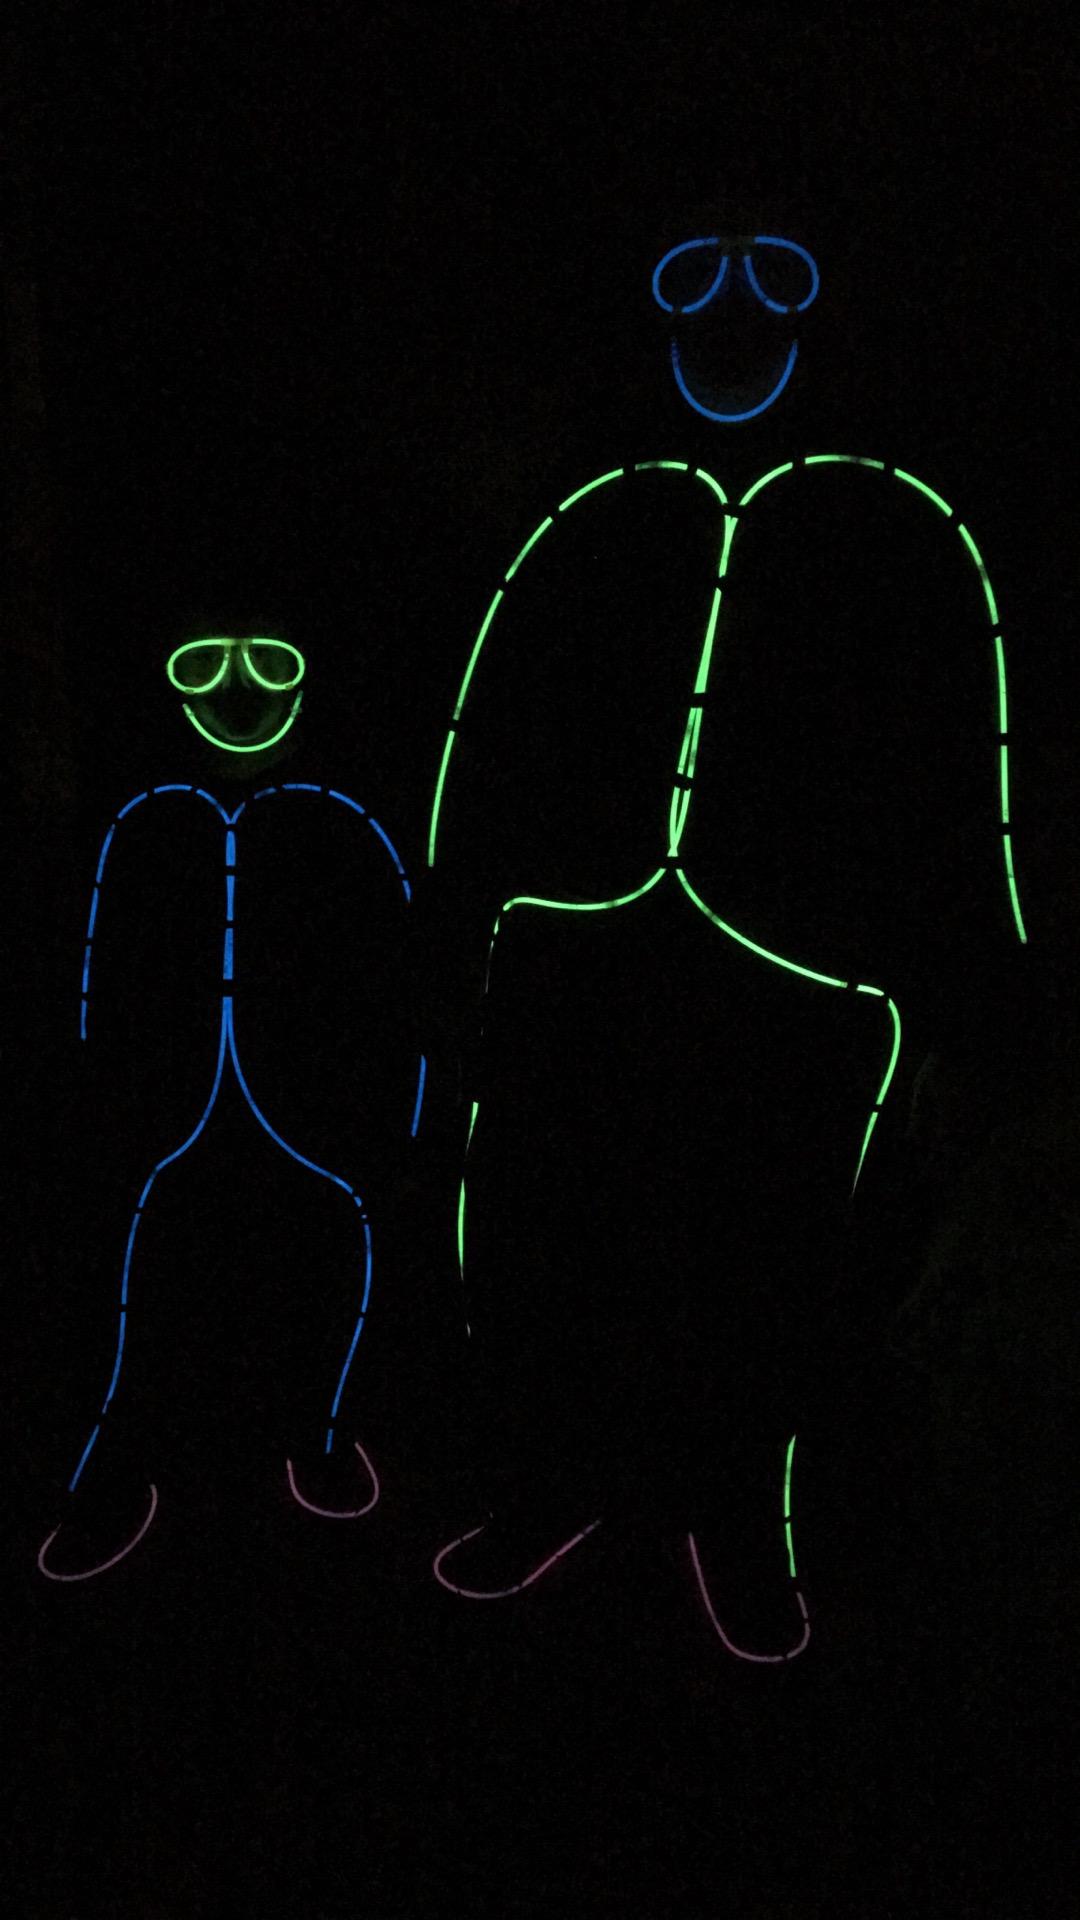 Glow in the dark stick man